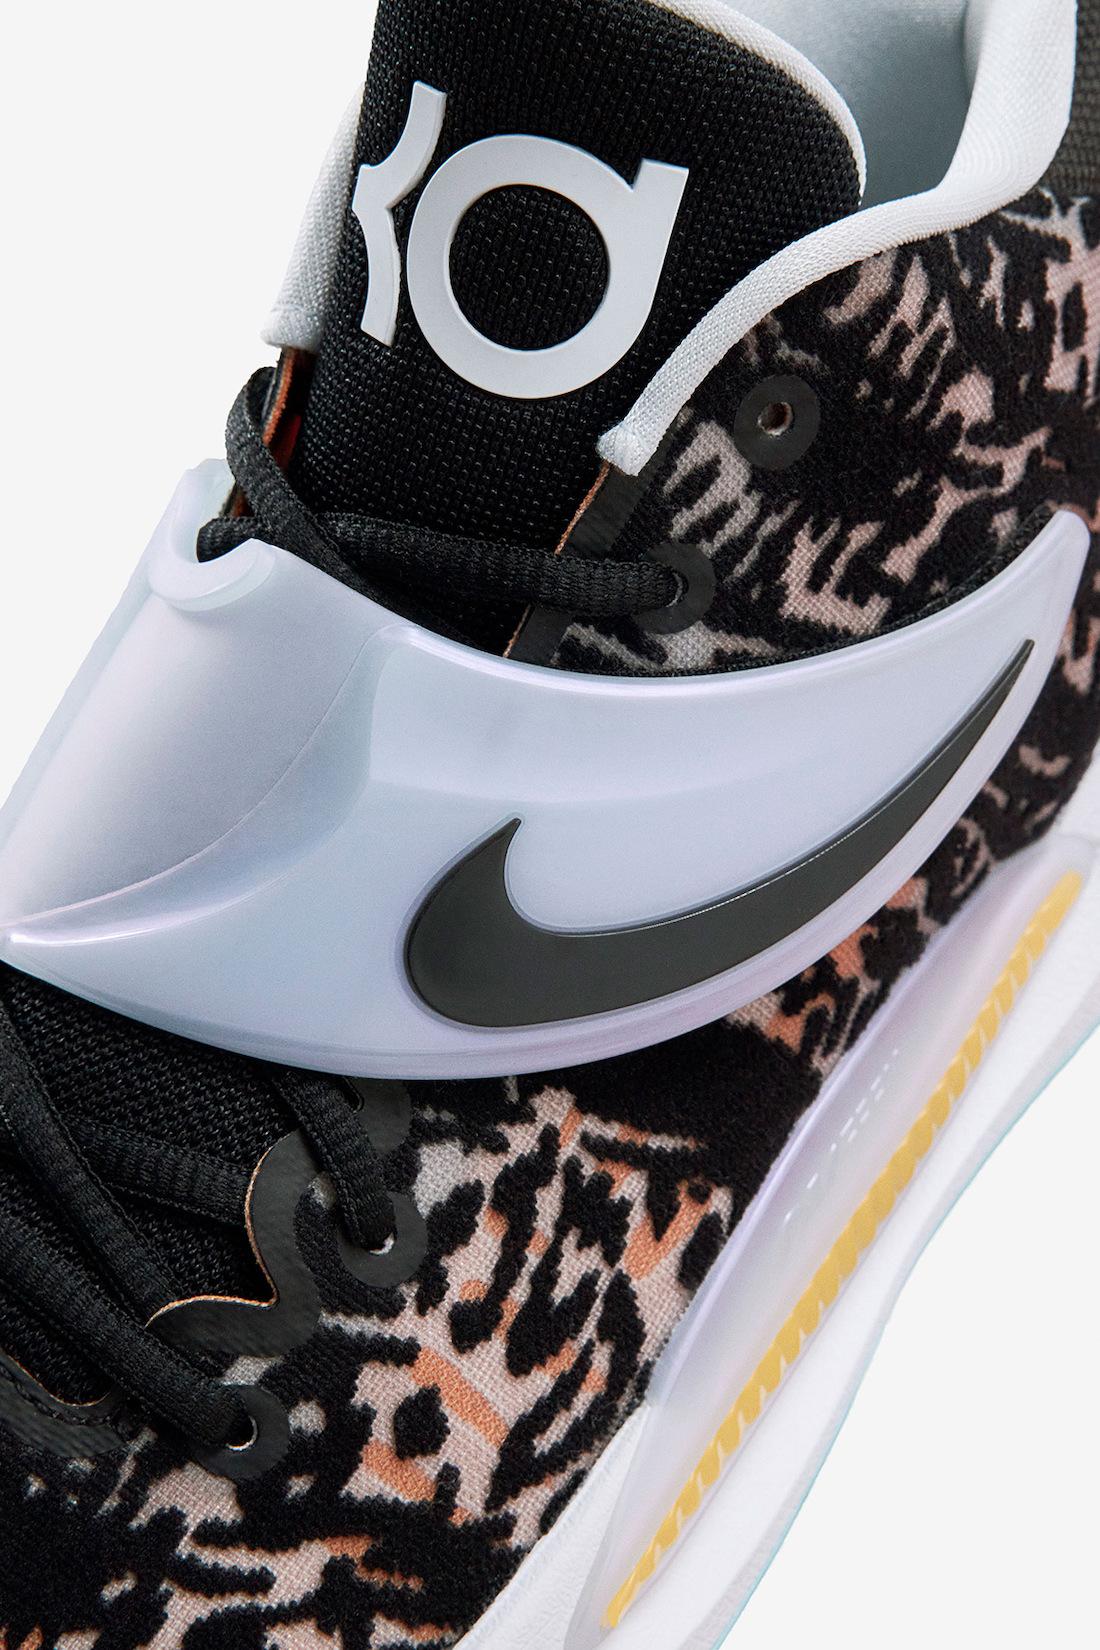 Nike KD 14 Release Info Price